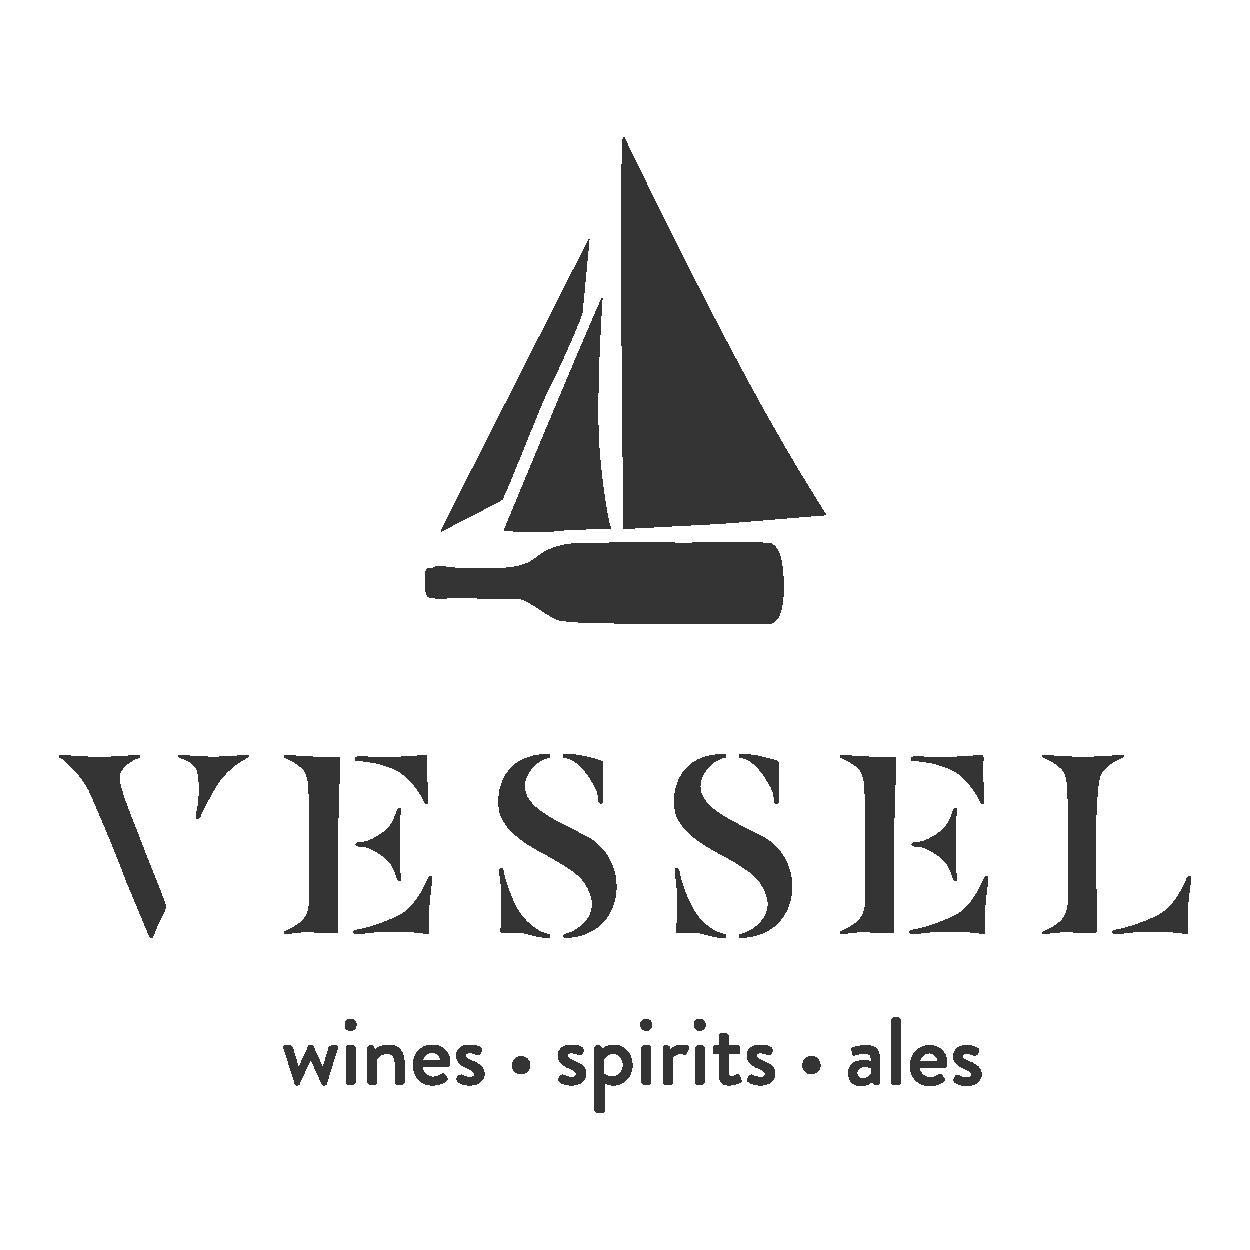 Vessel_Logo_BW-01.png